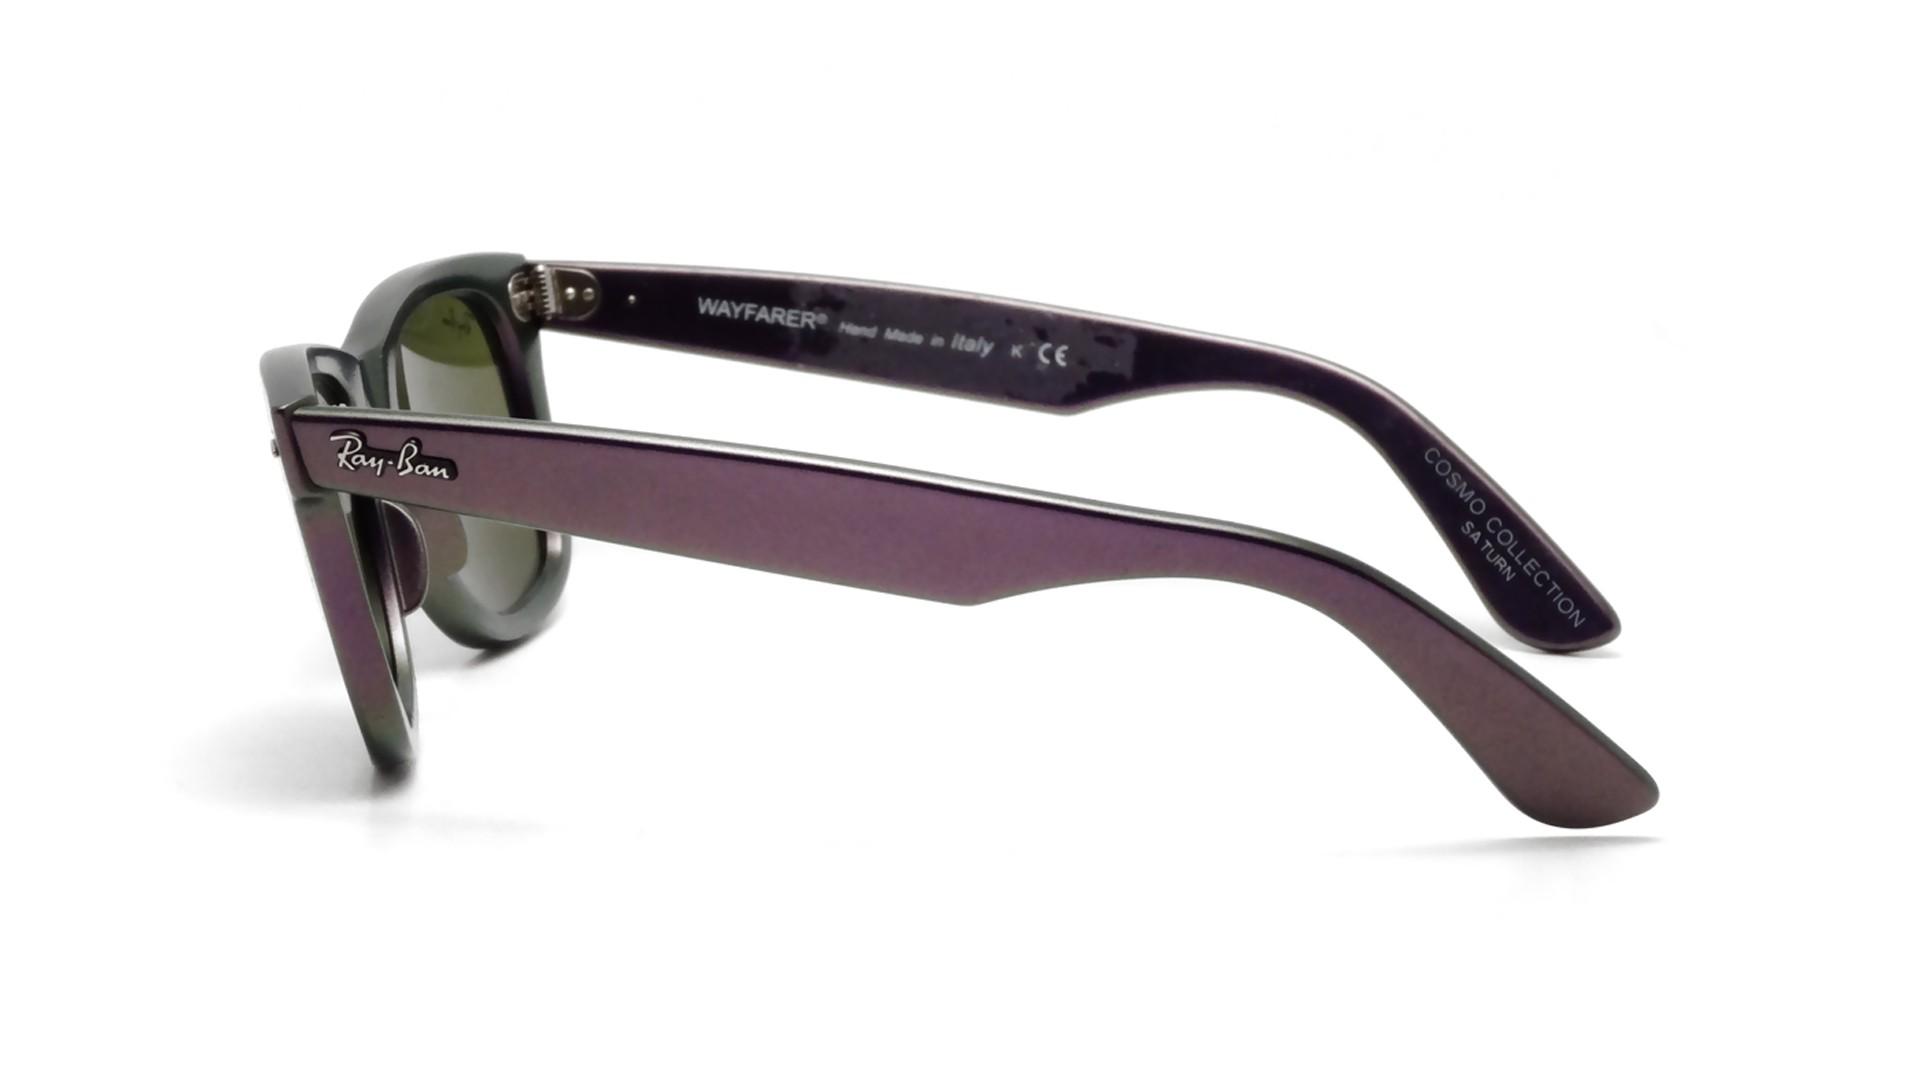 0df5080d83 Ray Ban Wayfarer 2140 Purple « Heritage Malta